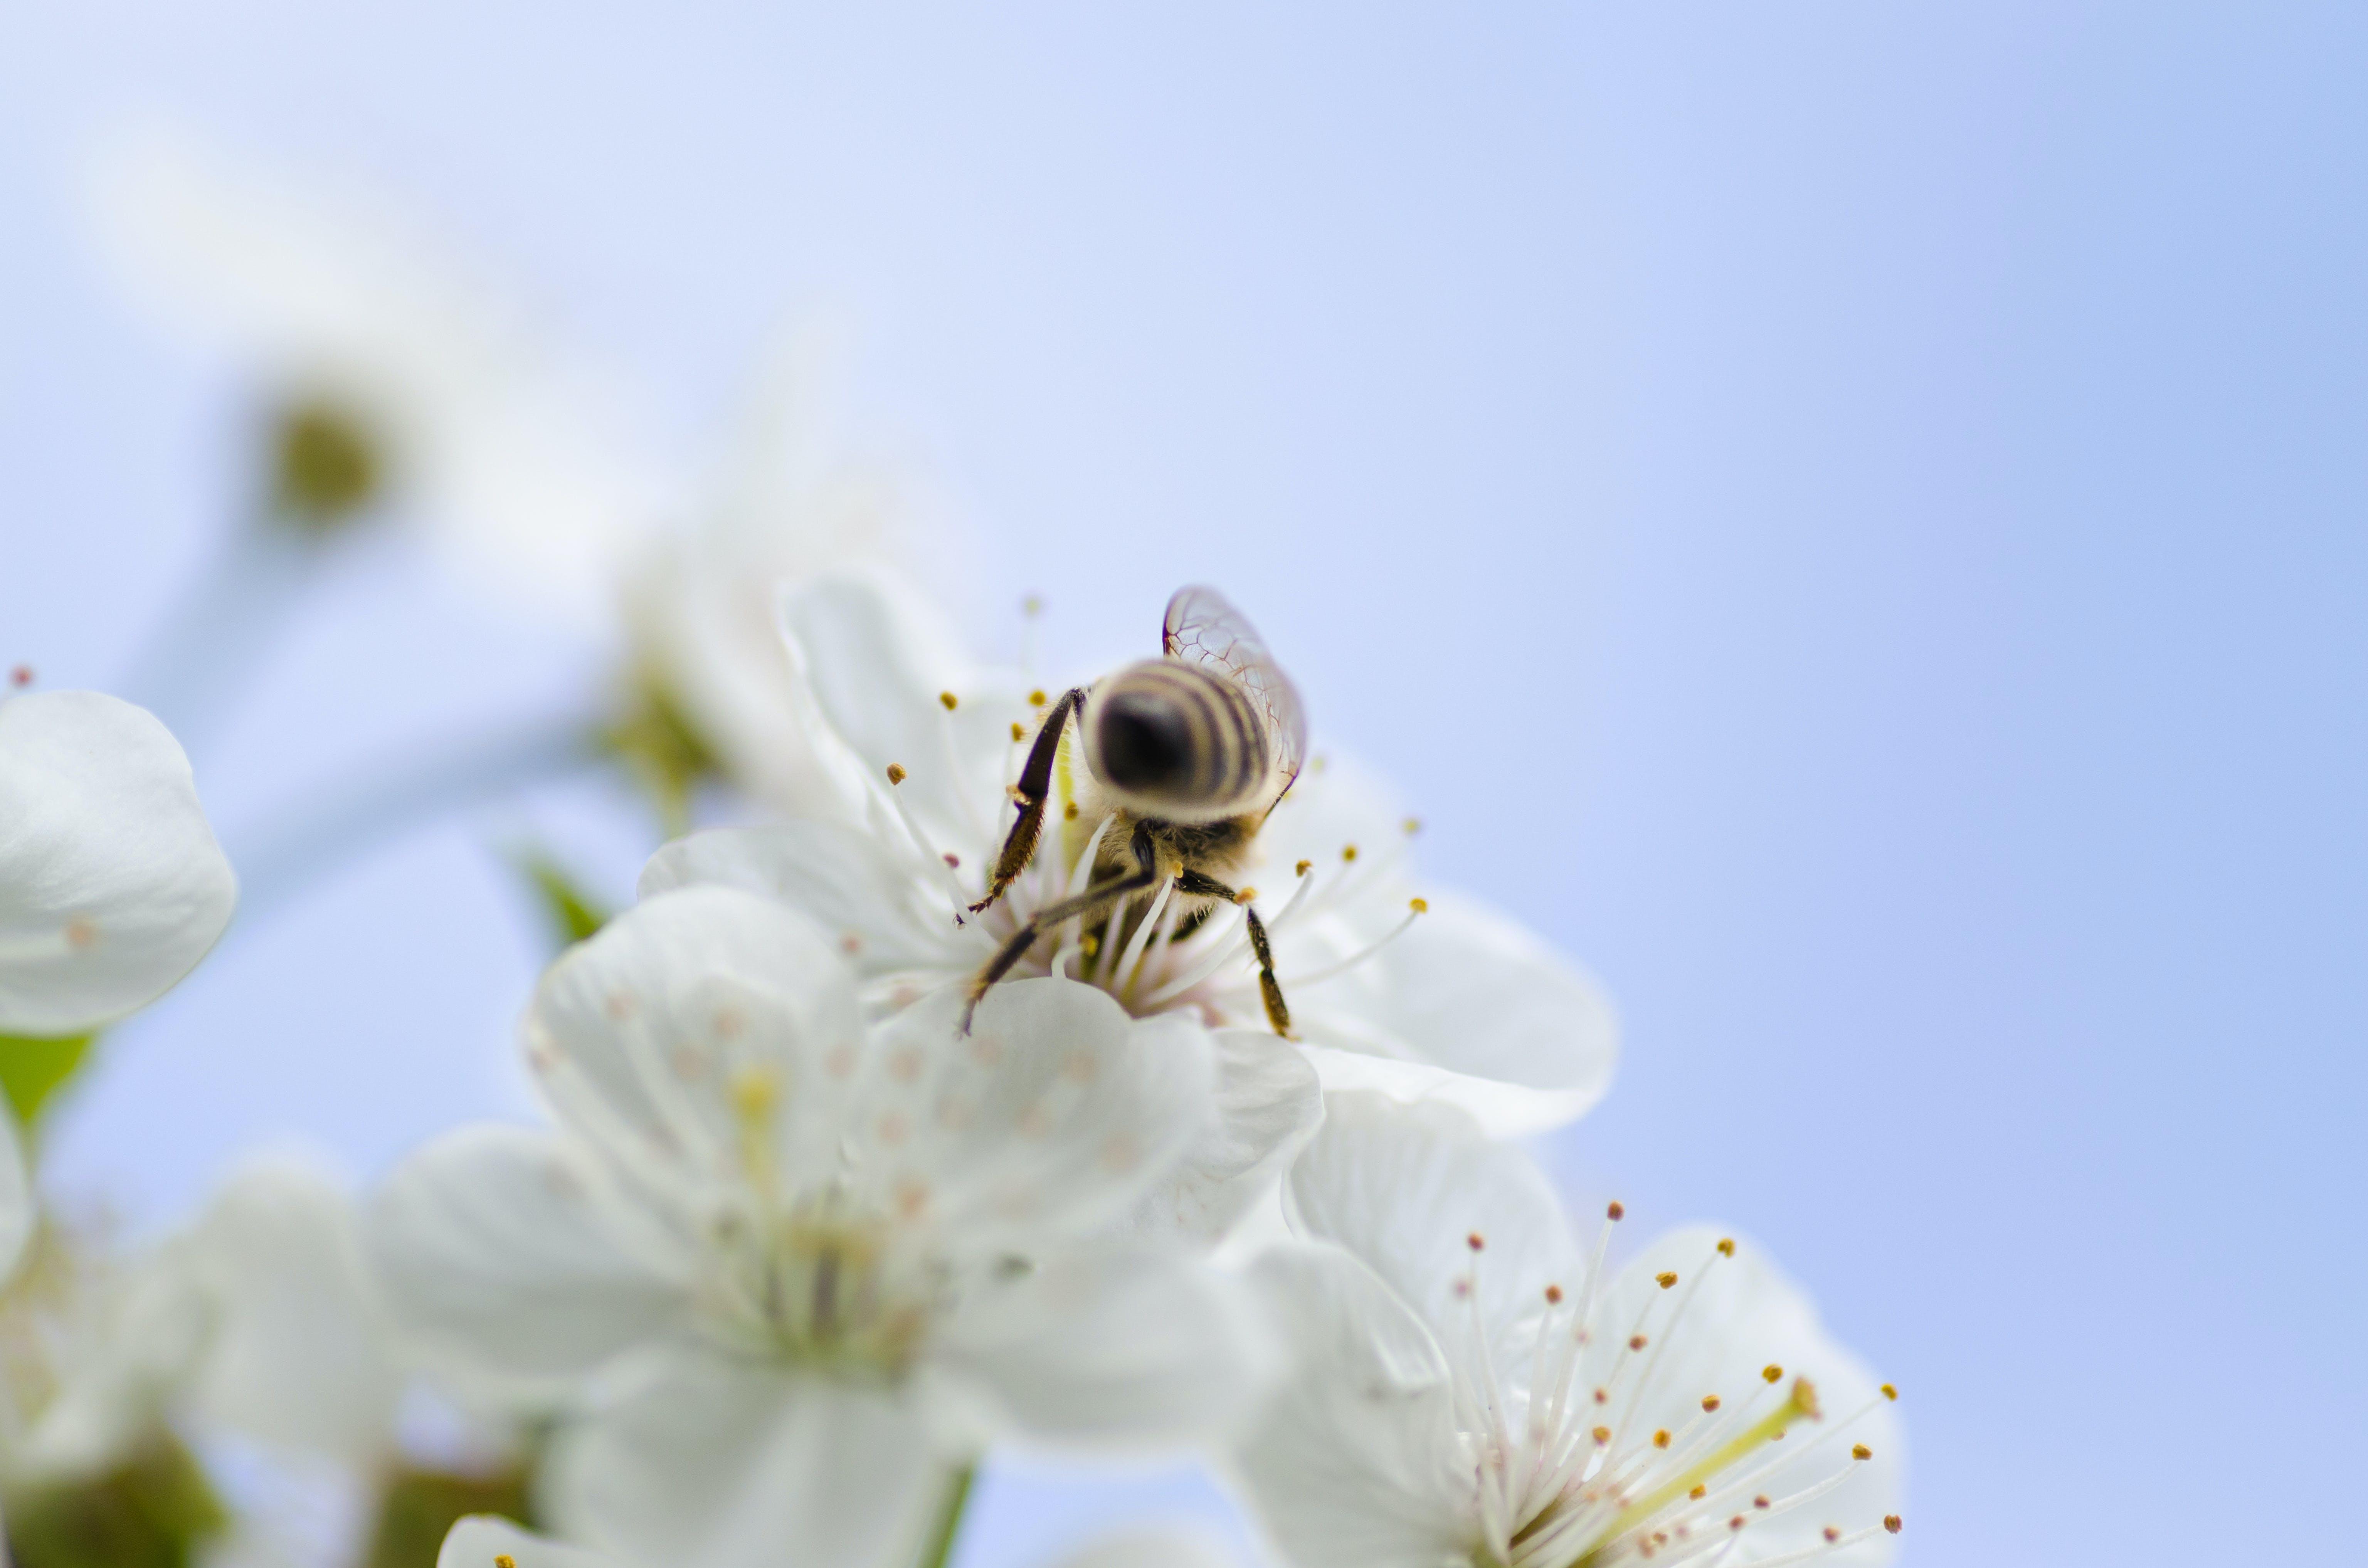 Selective Focus Photography of Honeybee Sucking Nectar on White Petaled Flower